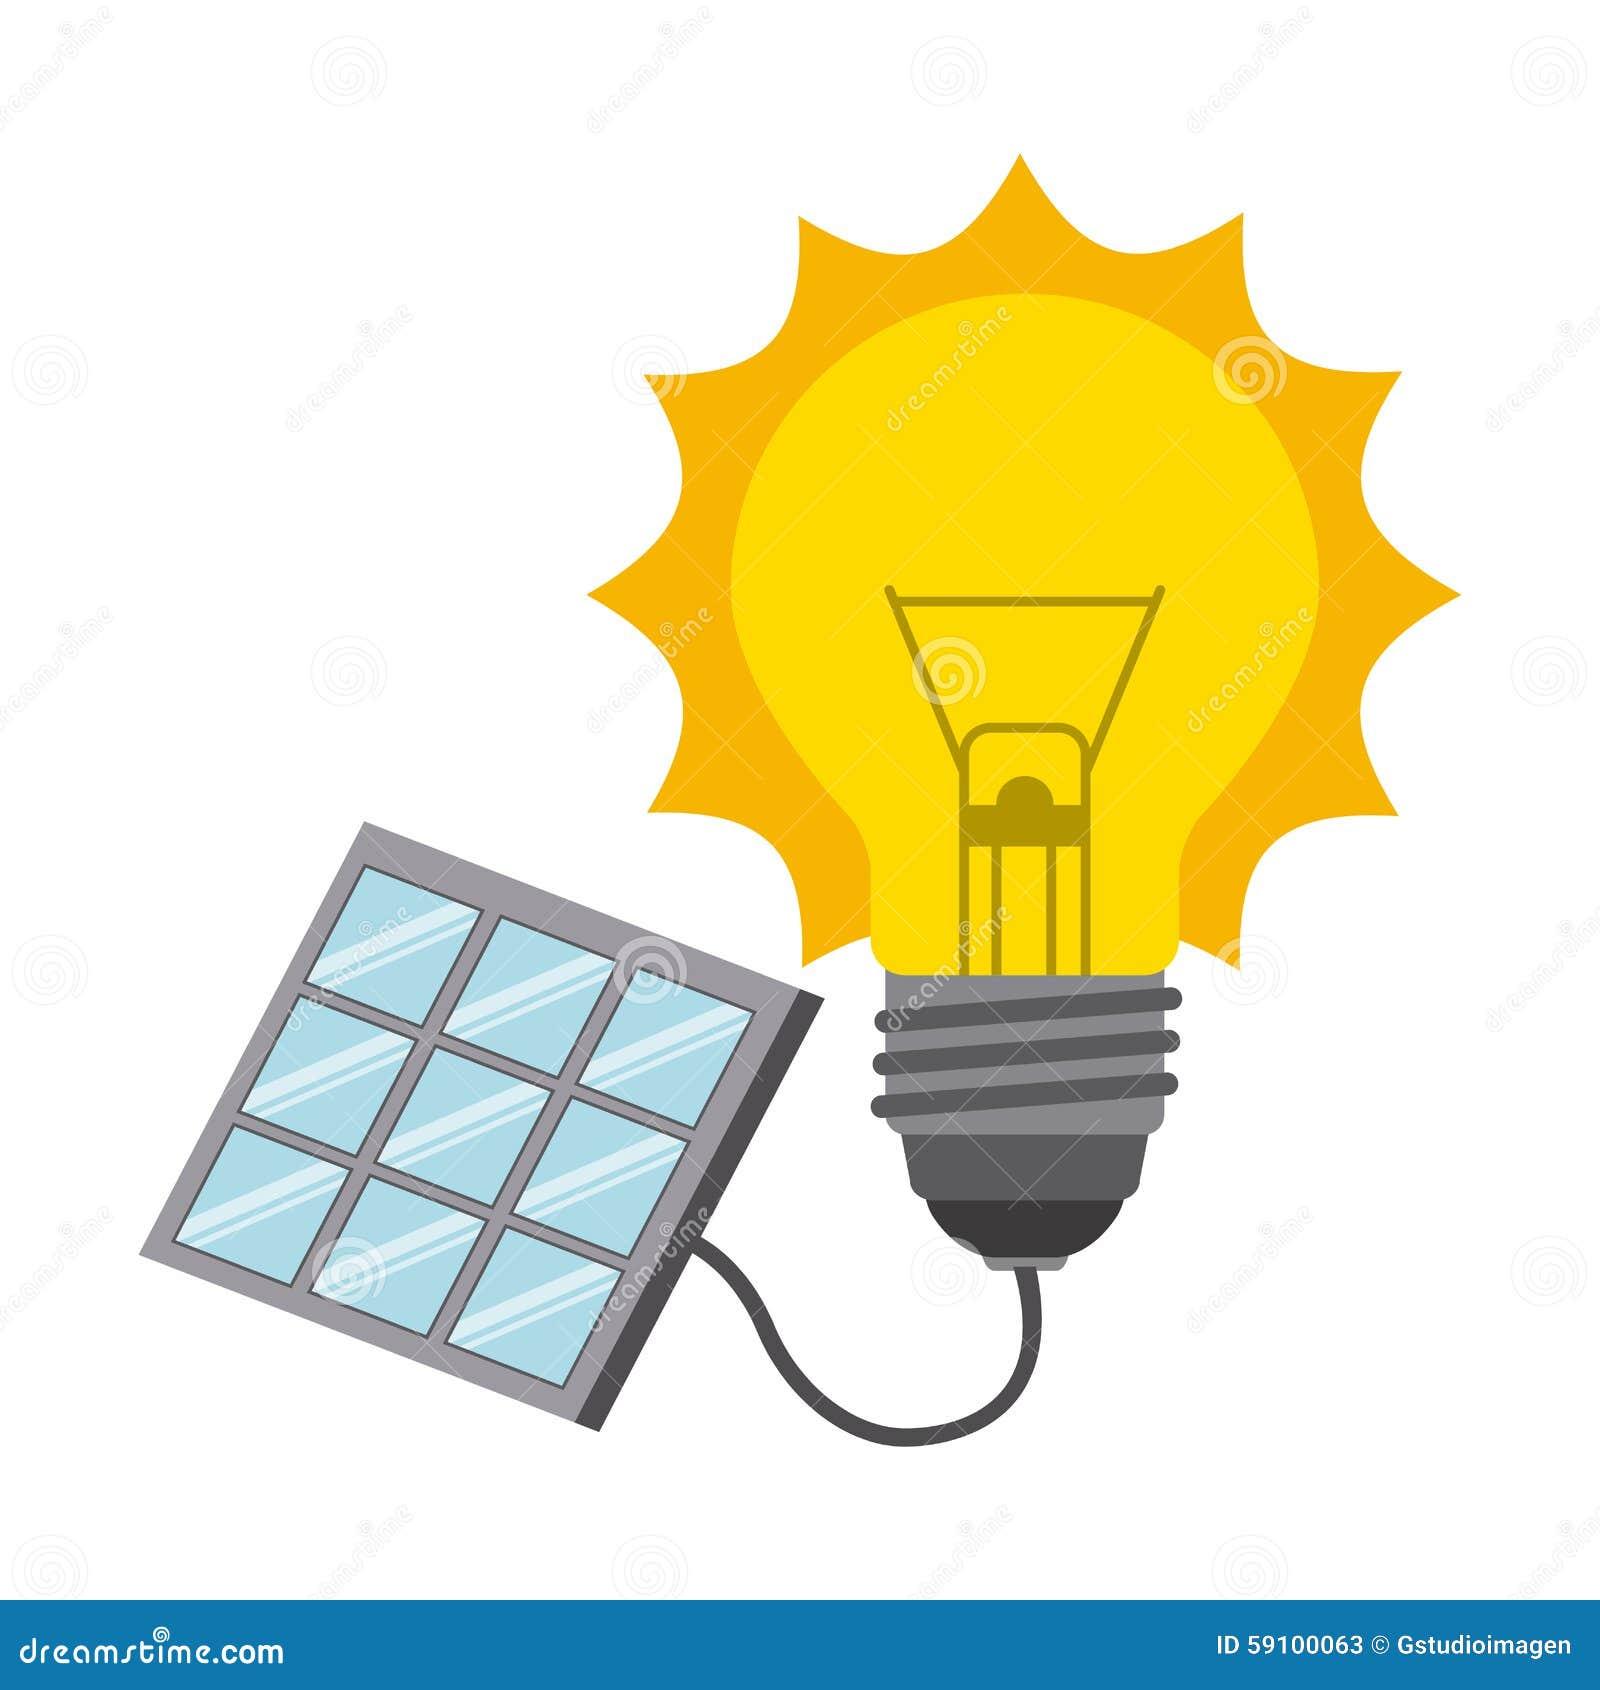 Solar energy design, vector illustration eps10 graphic.